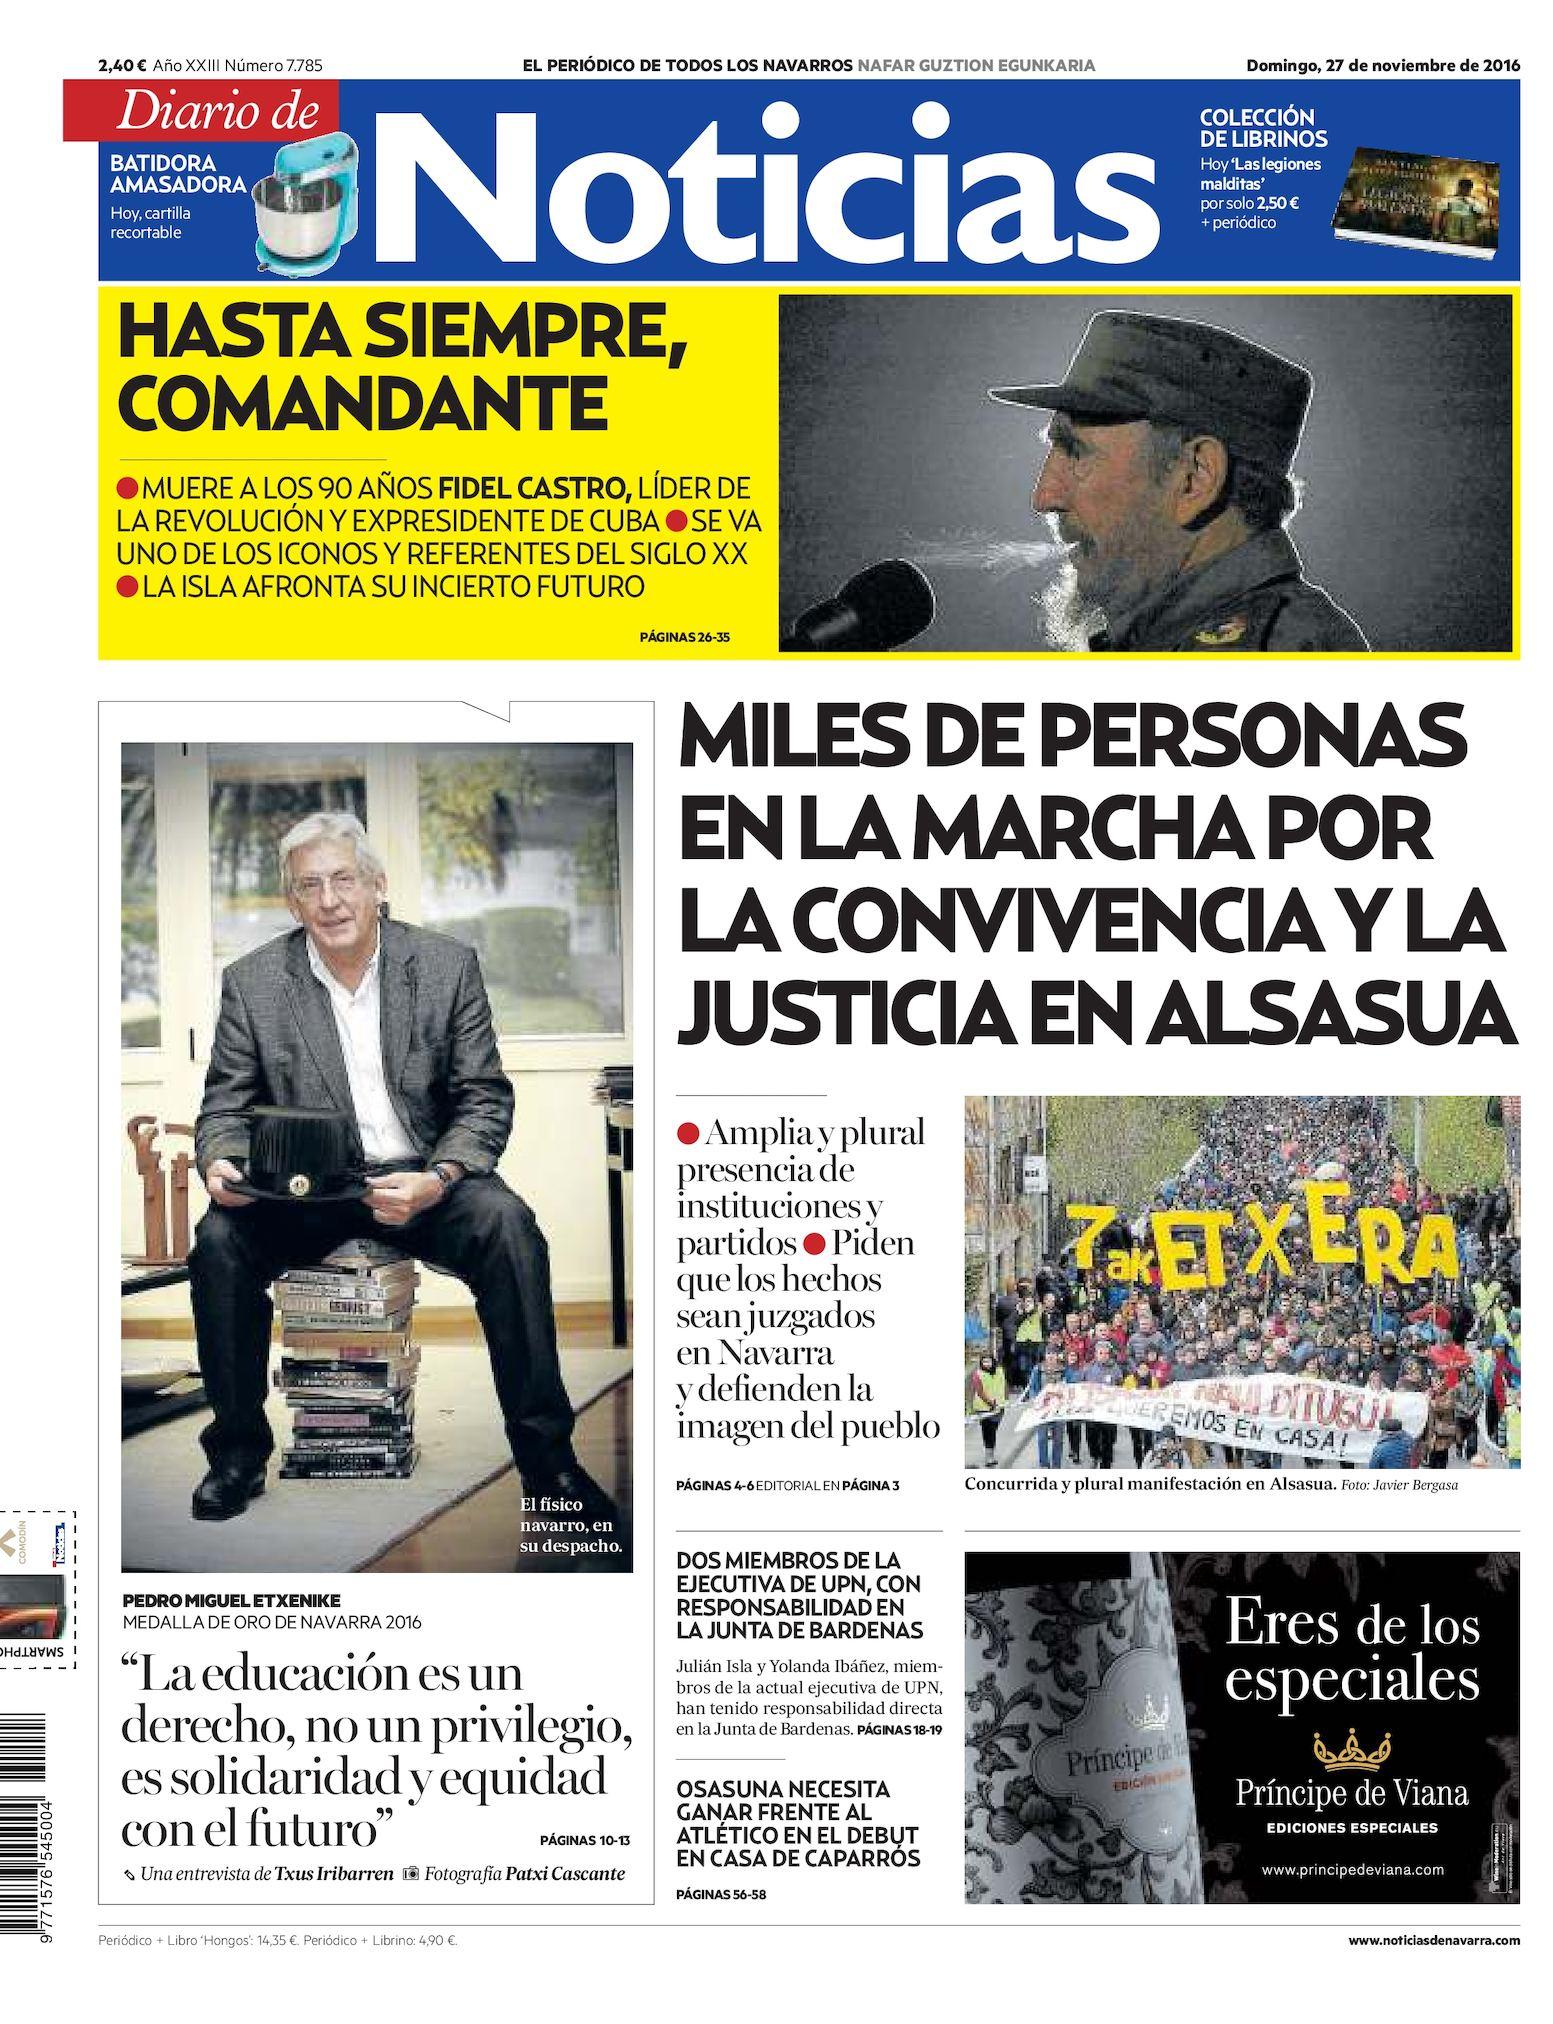 Calaméo - Diario de Noticias 20161127 070b7f906ca